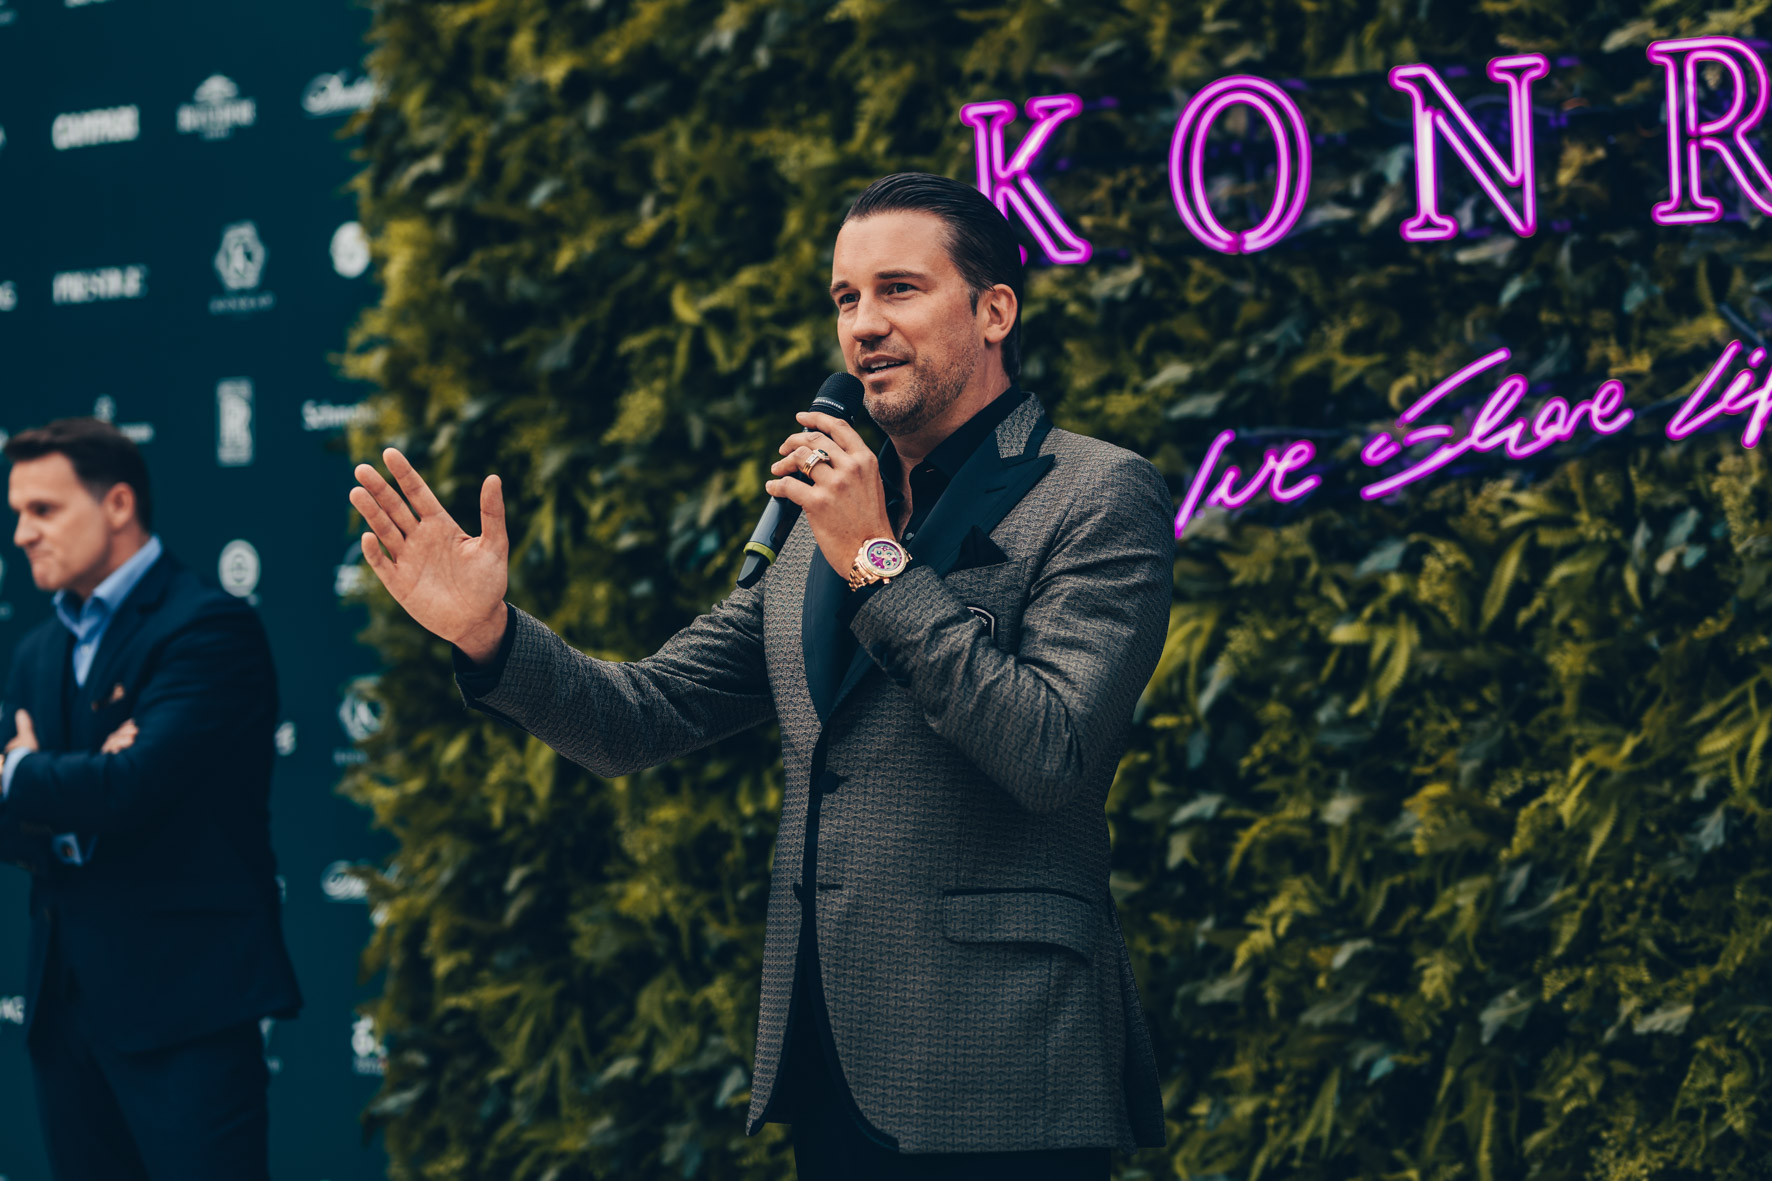 Konrad-lifestyle-art-basel-%22c.f.bucherer%22-2019-77.jpg